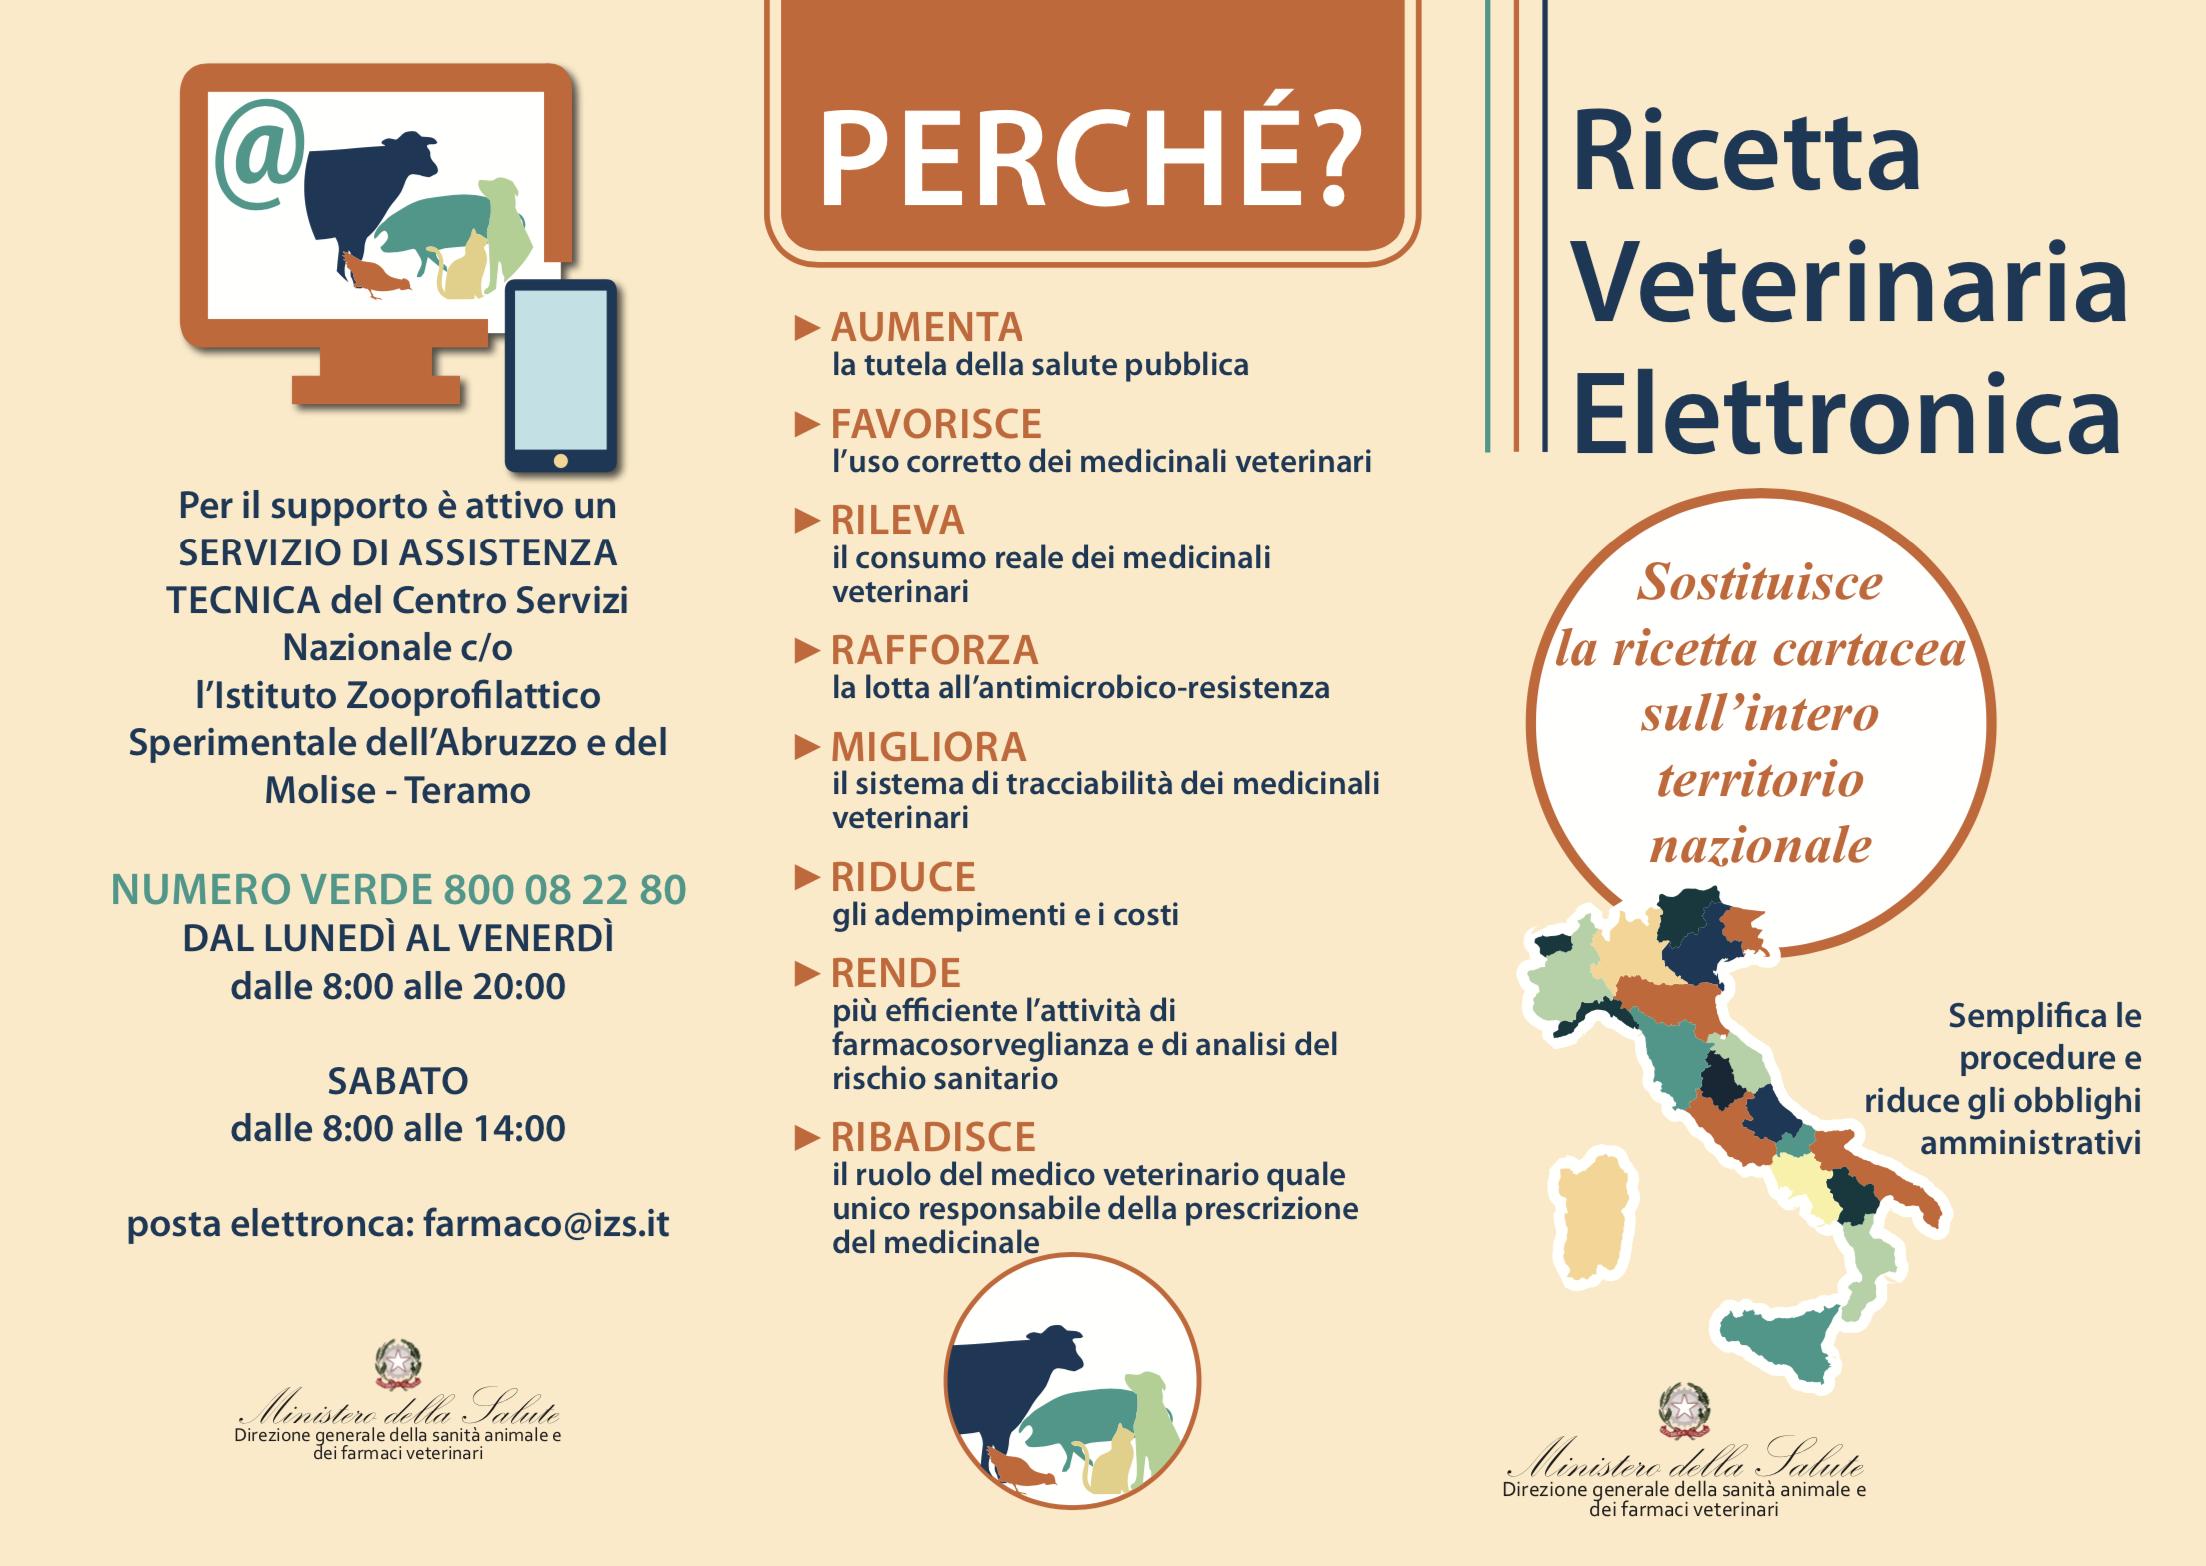 Ricetta Elettronica Veterinaria Obbligo.Ricetta Elettrica Bottarivet